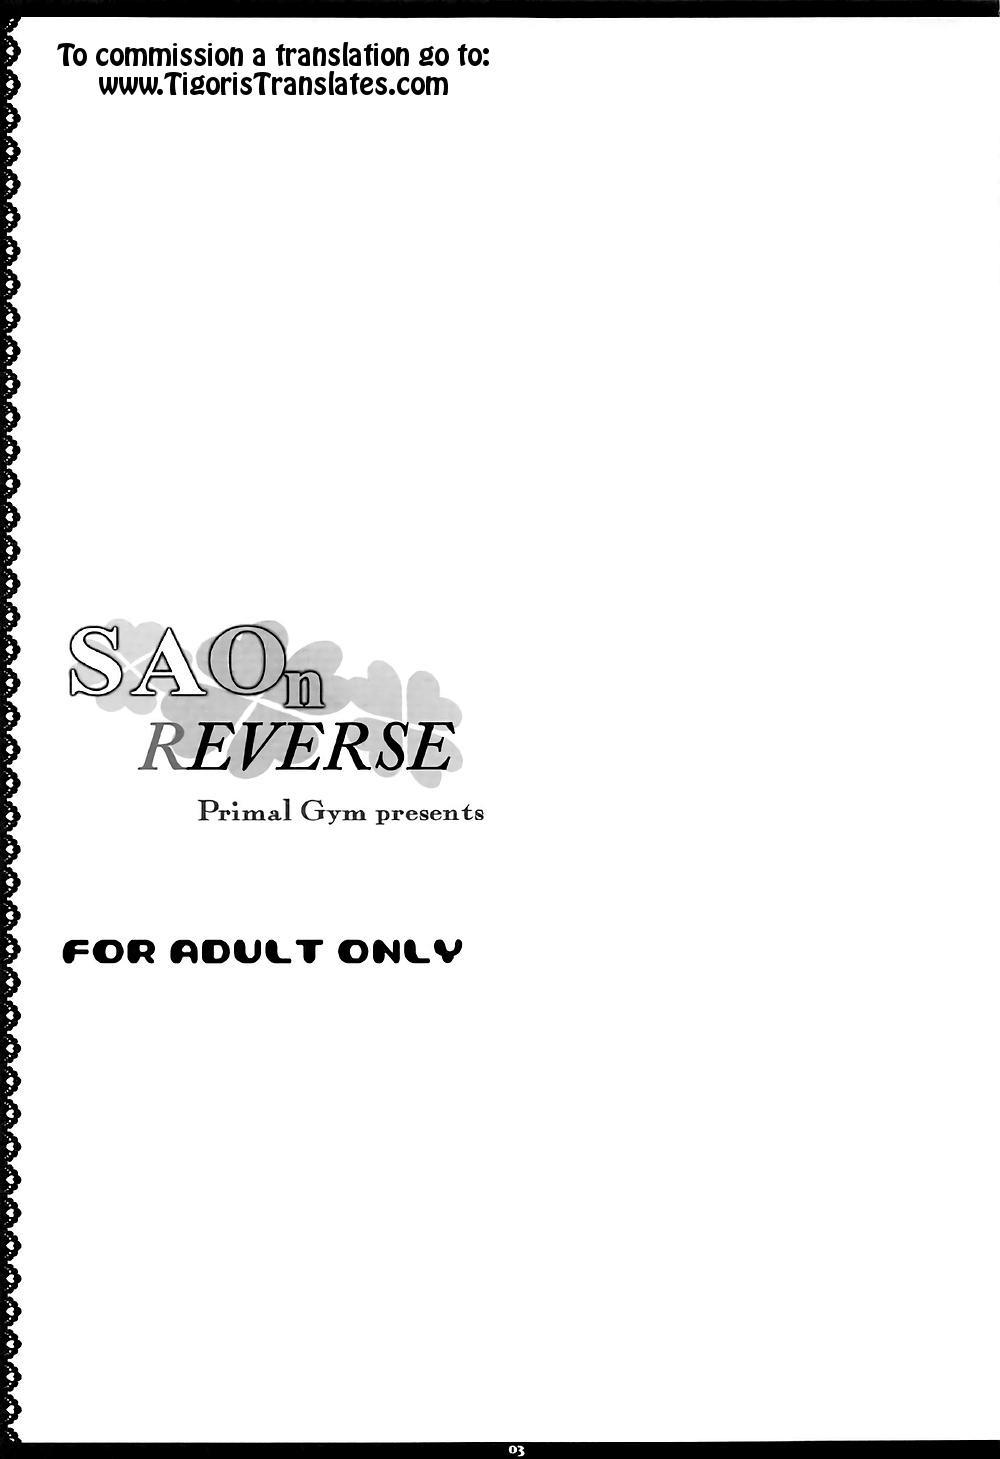 SAOn REVERSE 1